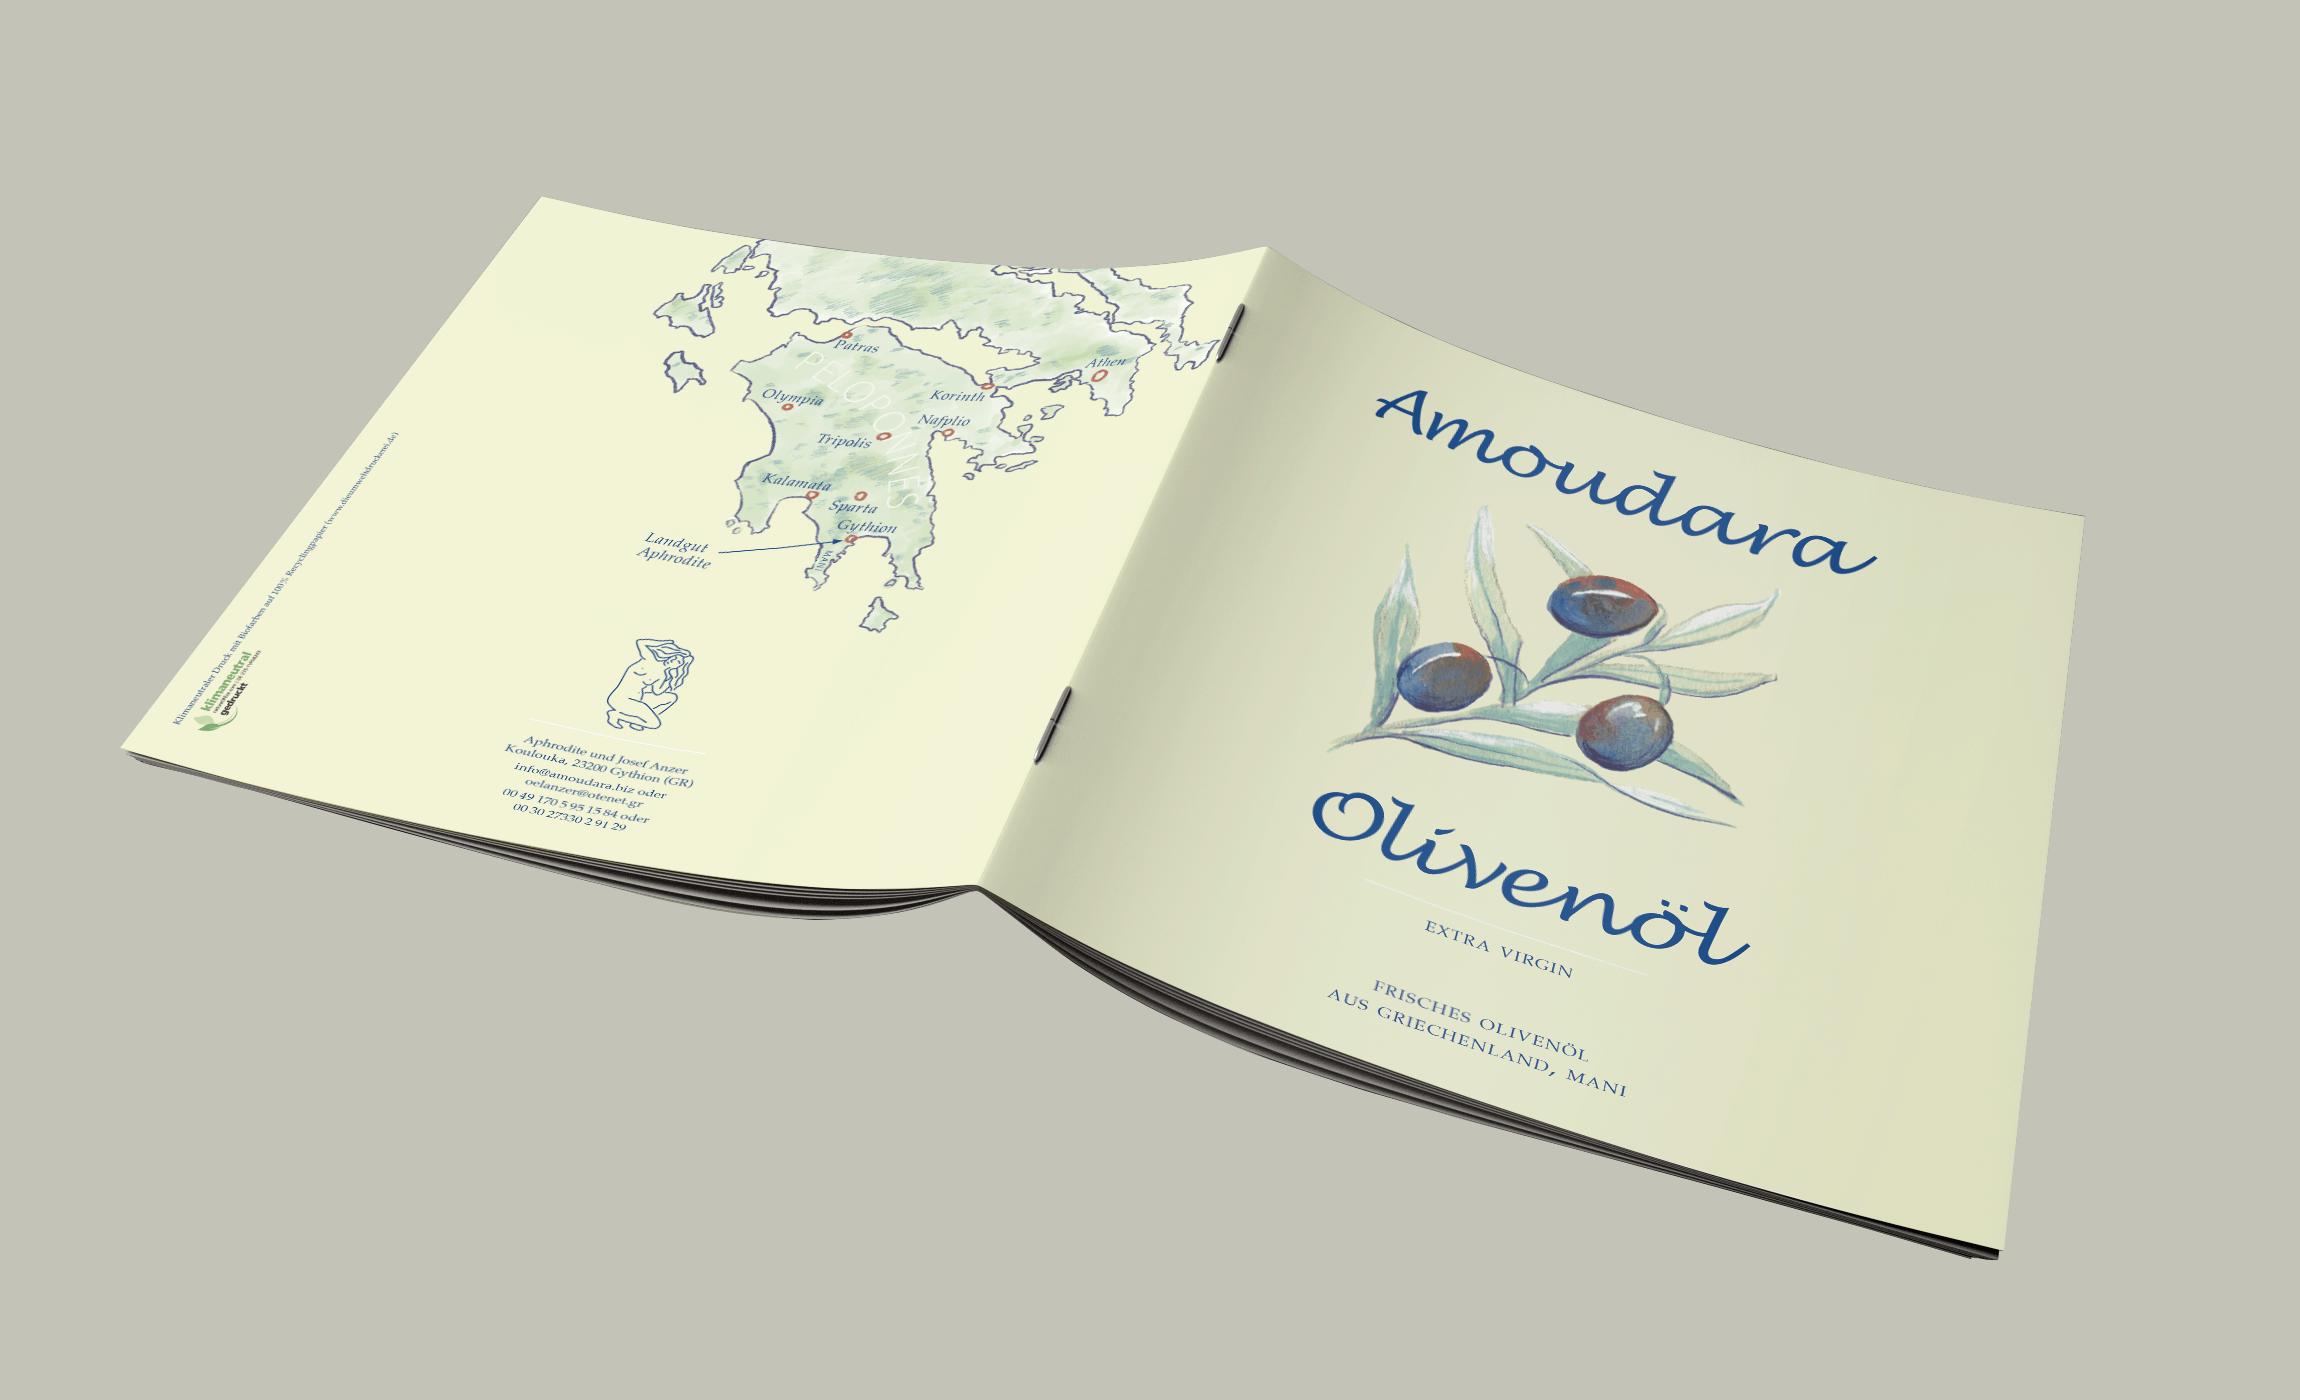 Prospekt für Amoudara Olivenöl